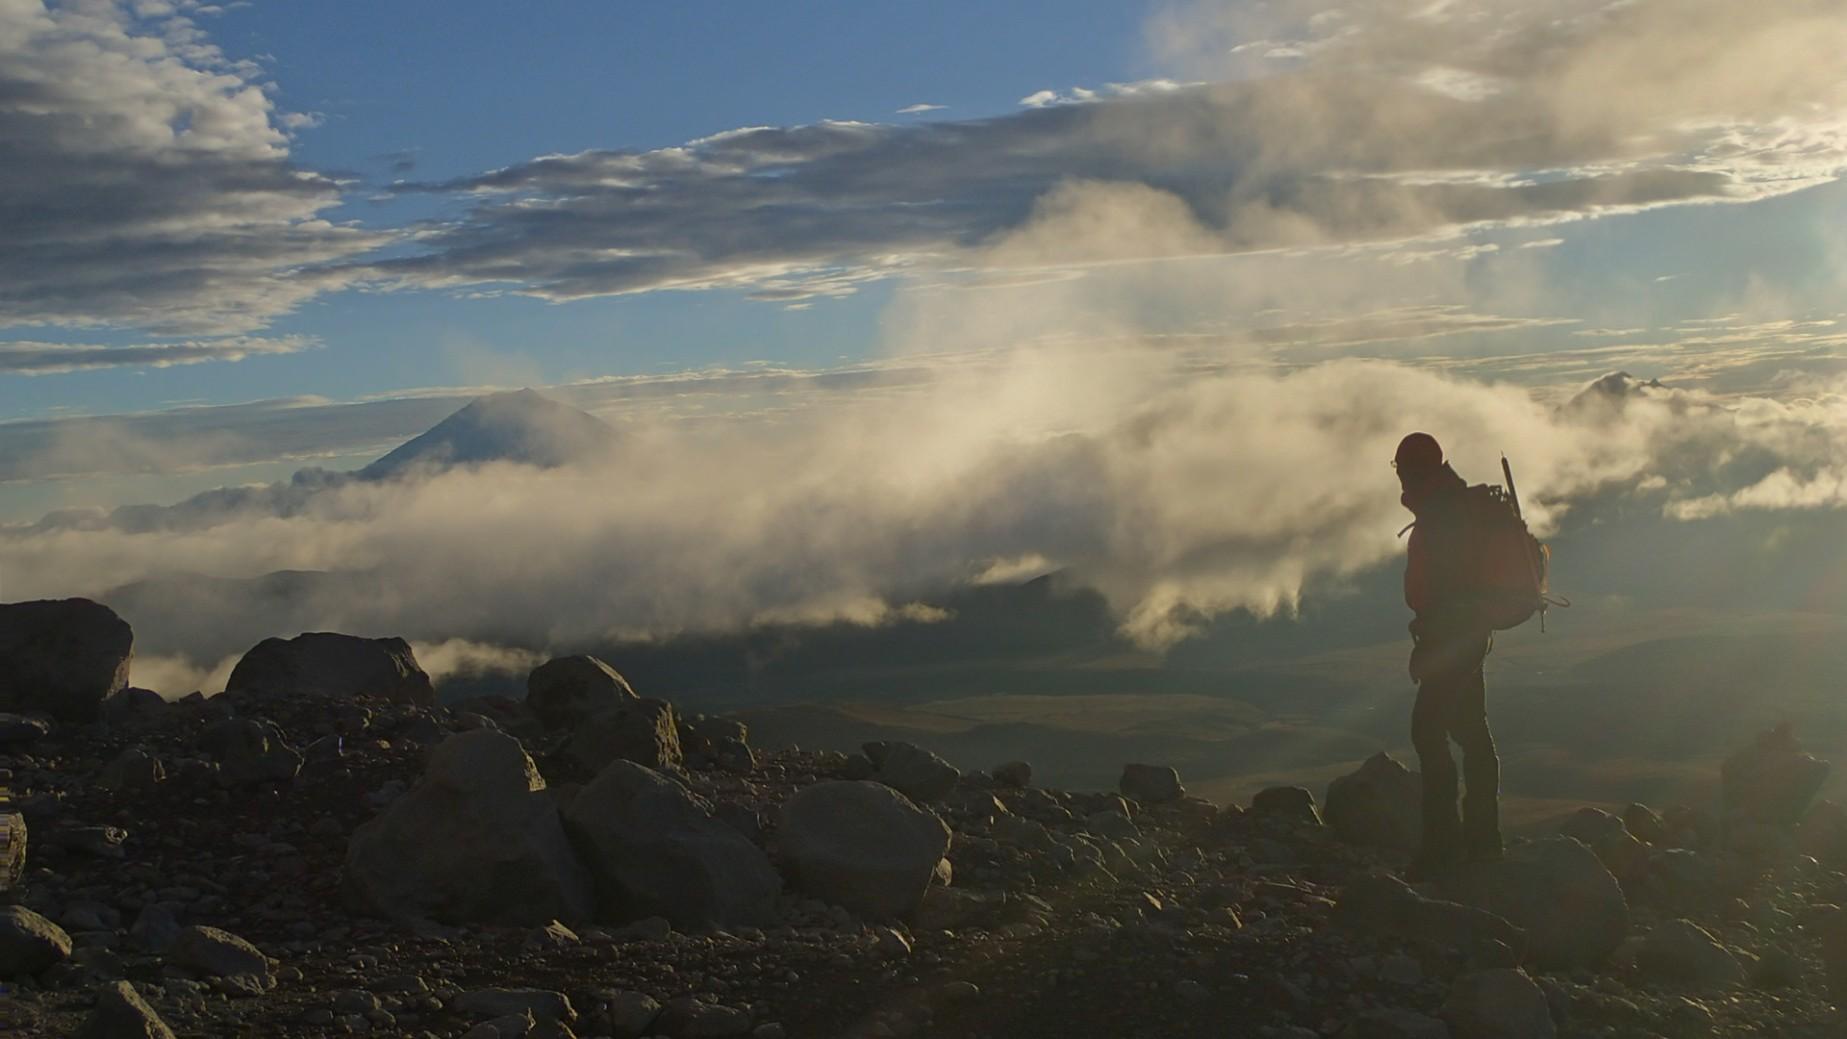 ecu22-sunset-walk-beside-a-volcanic-lake-im-free